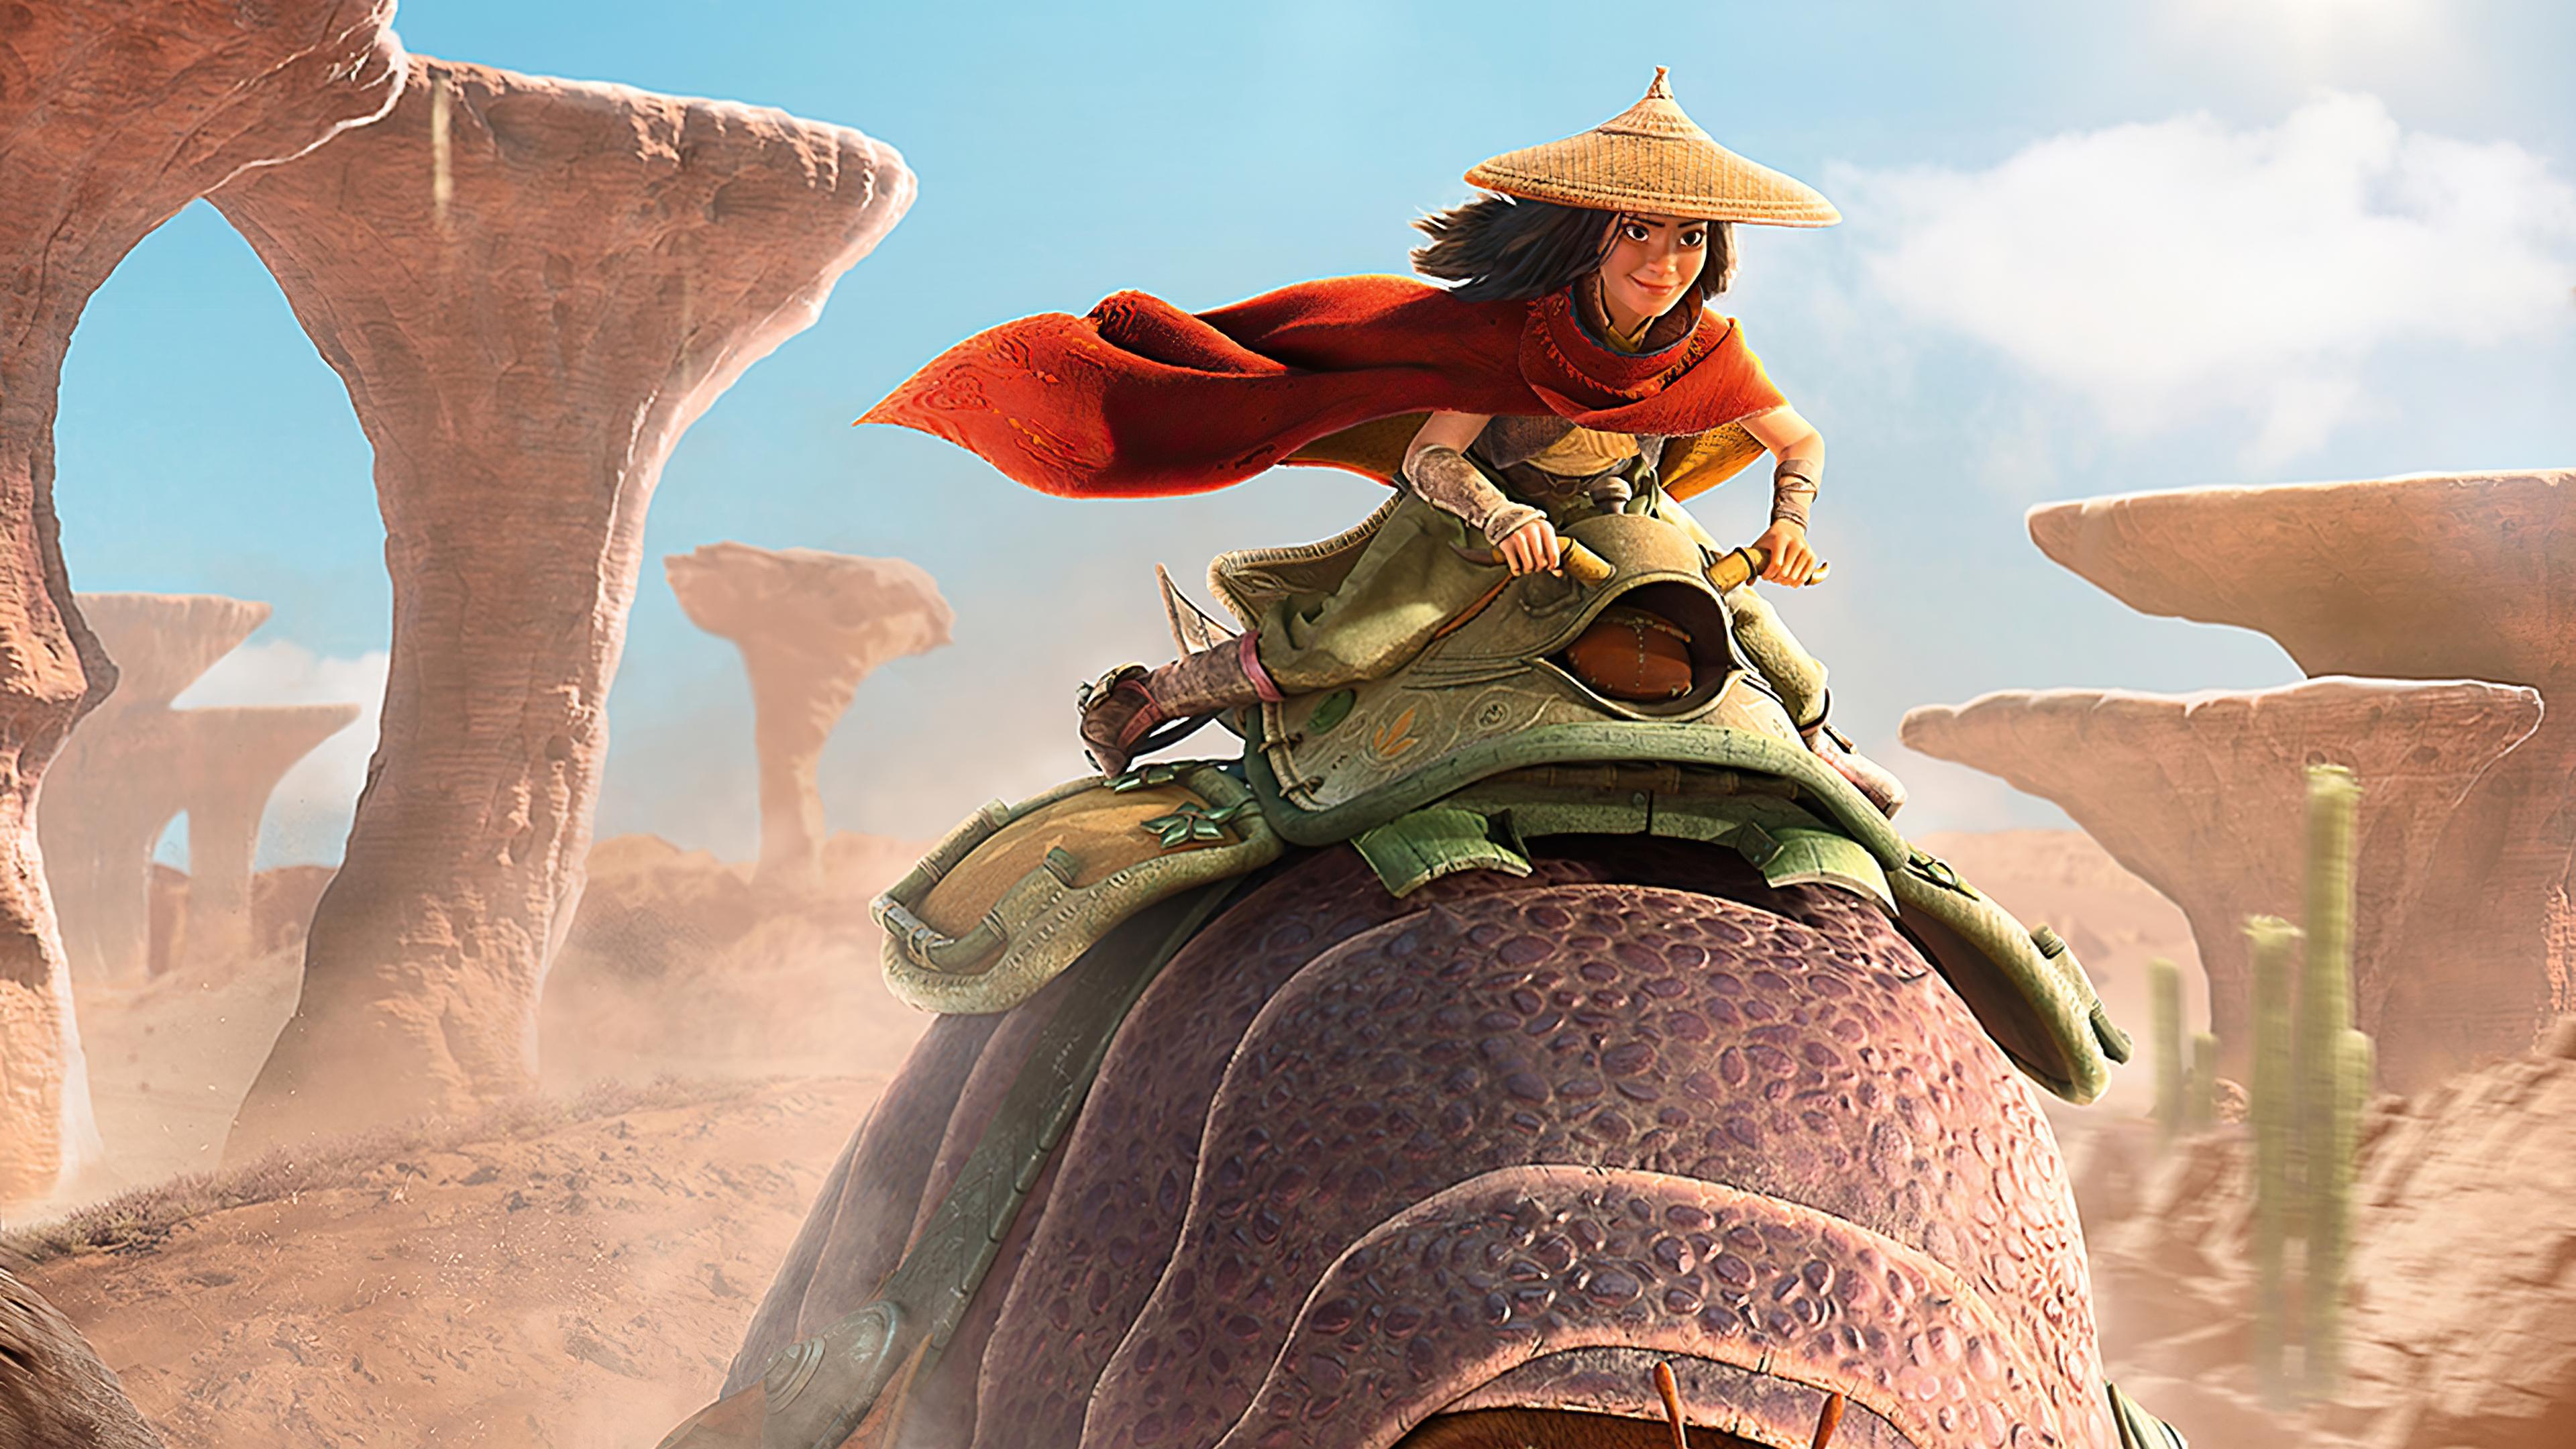 raya and the last dragon movie 4k 1617448838 - Raya And The Last Dragon Movie 4k - Raya And The Last Dragon Movie 4k wallpapers